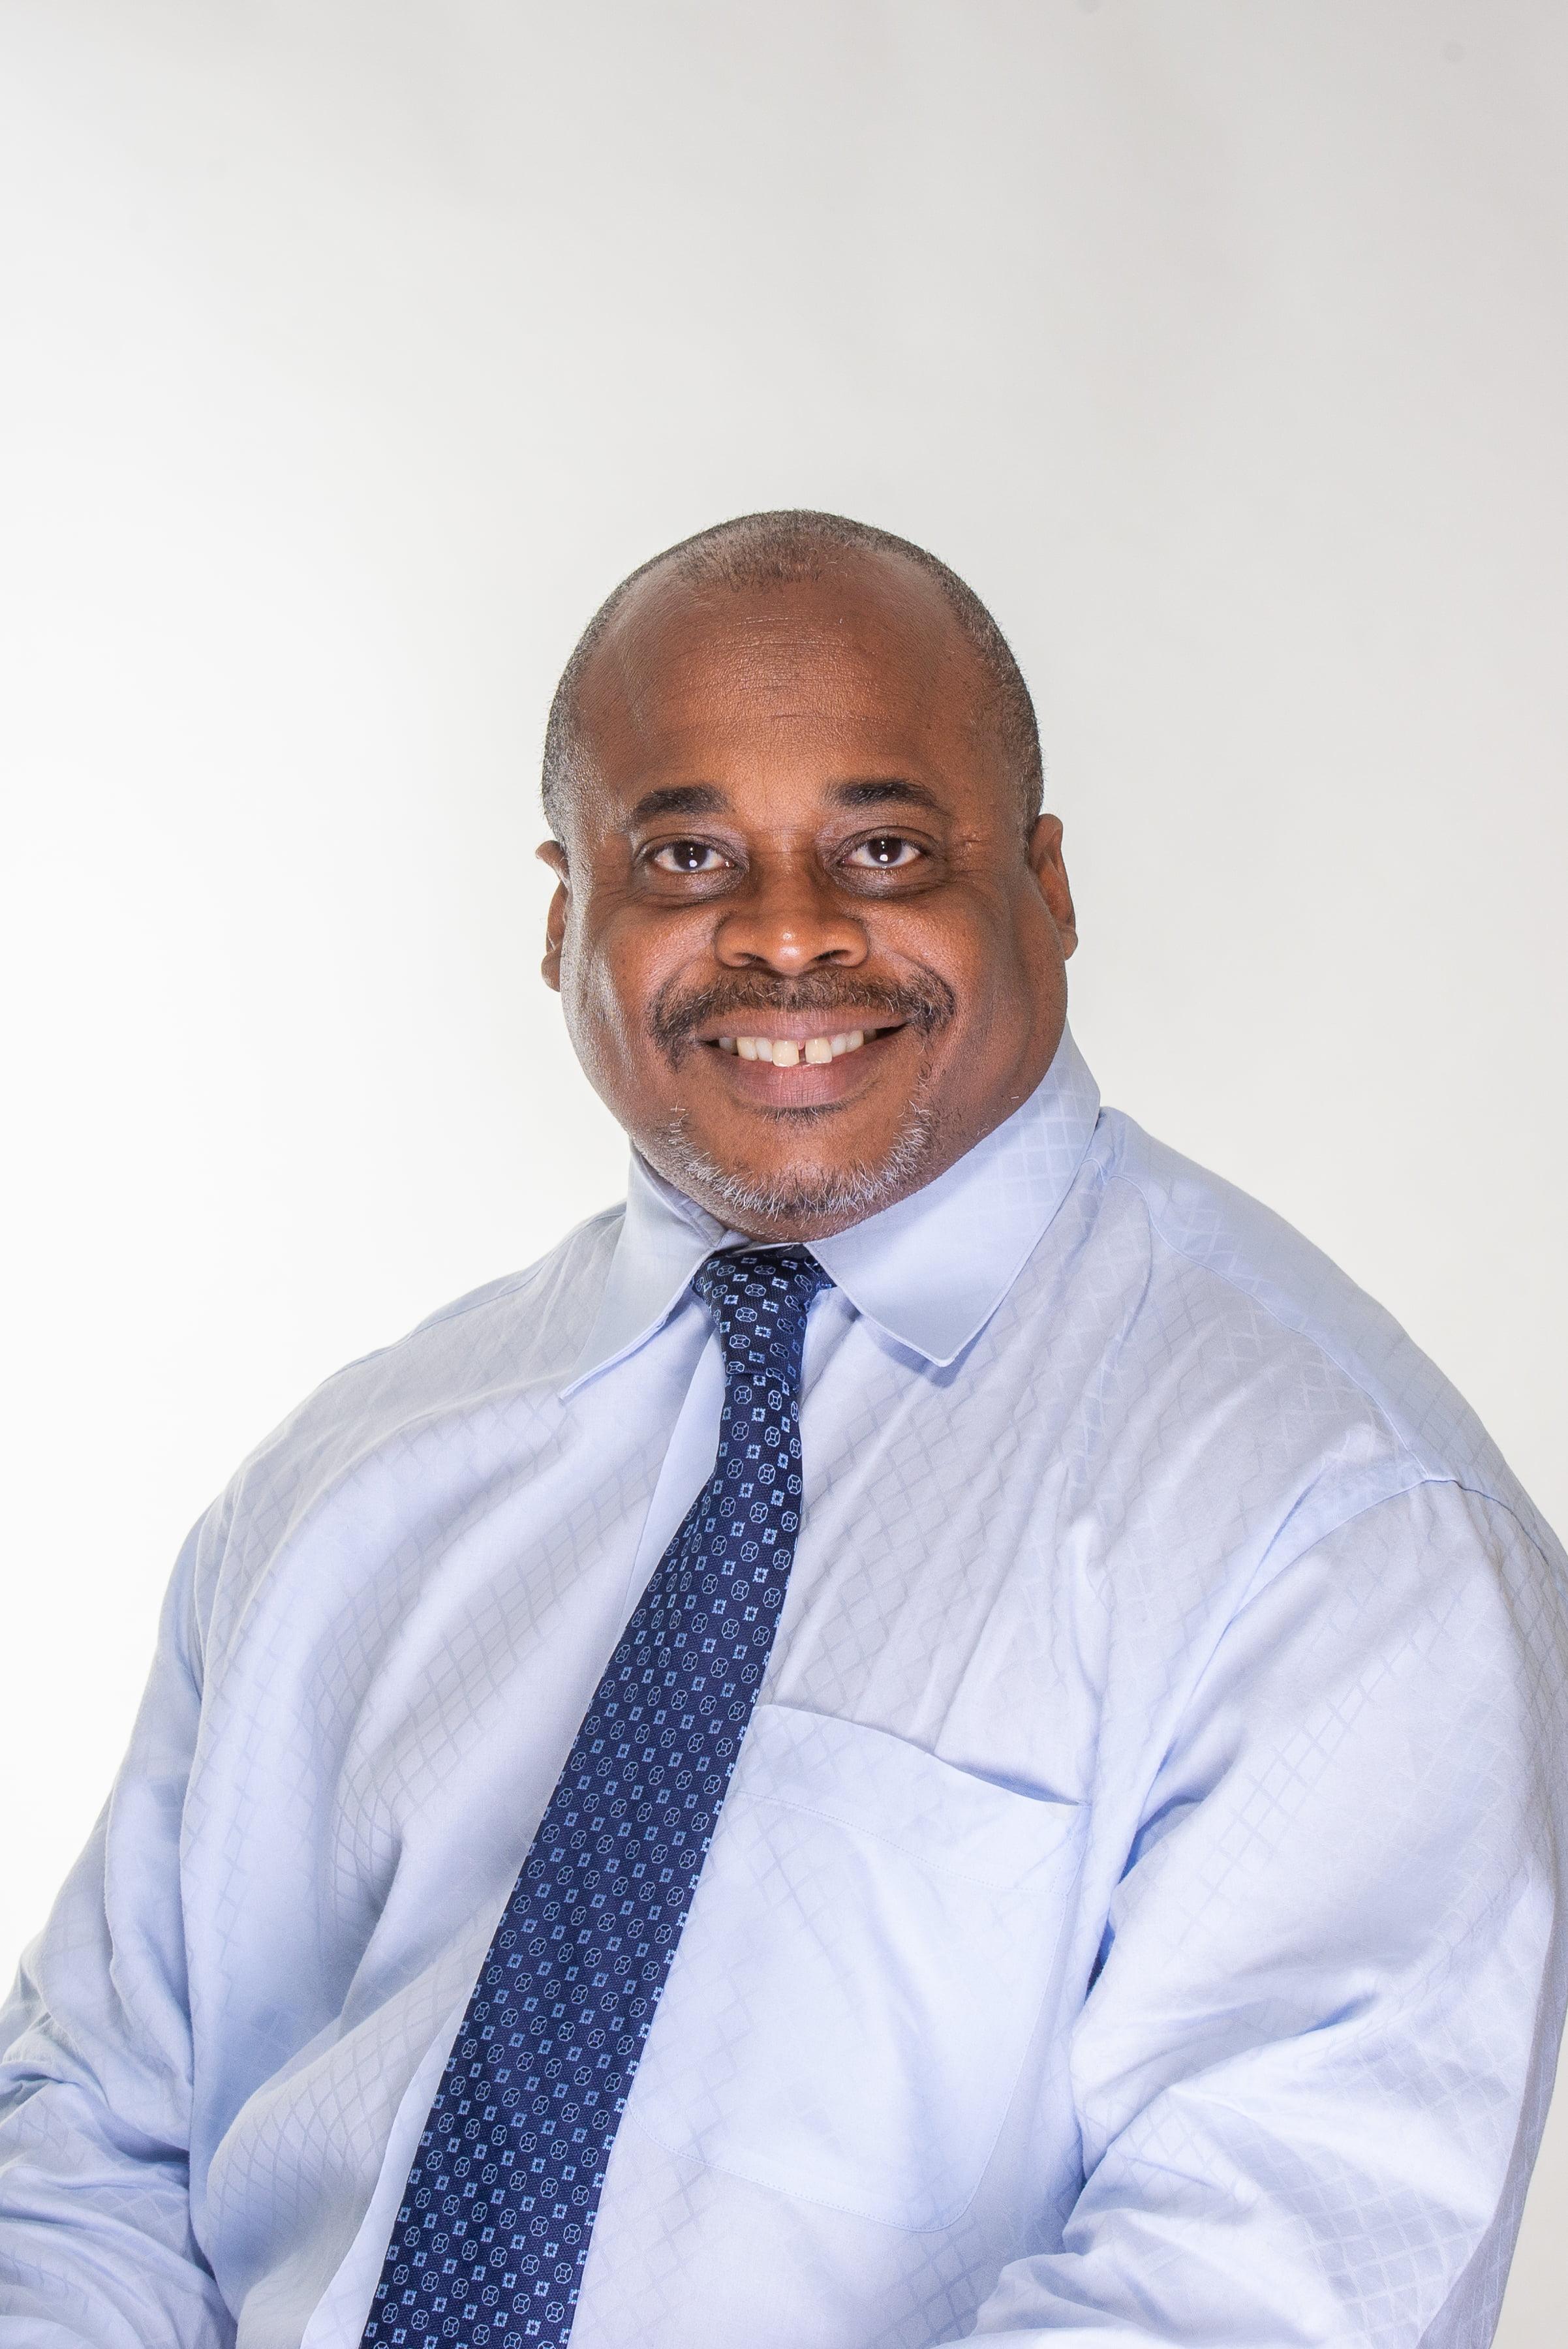 Dr. Adrian James